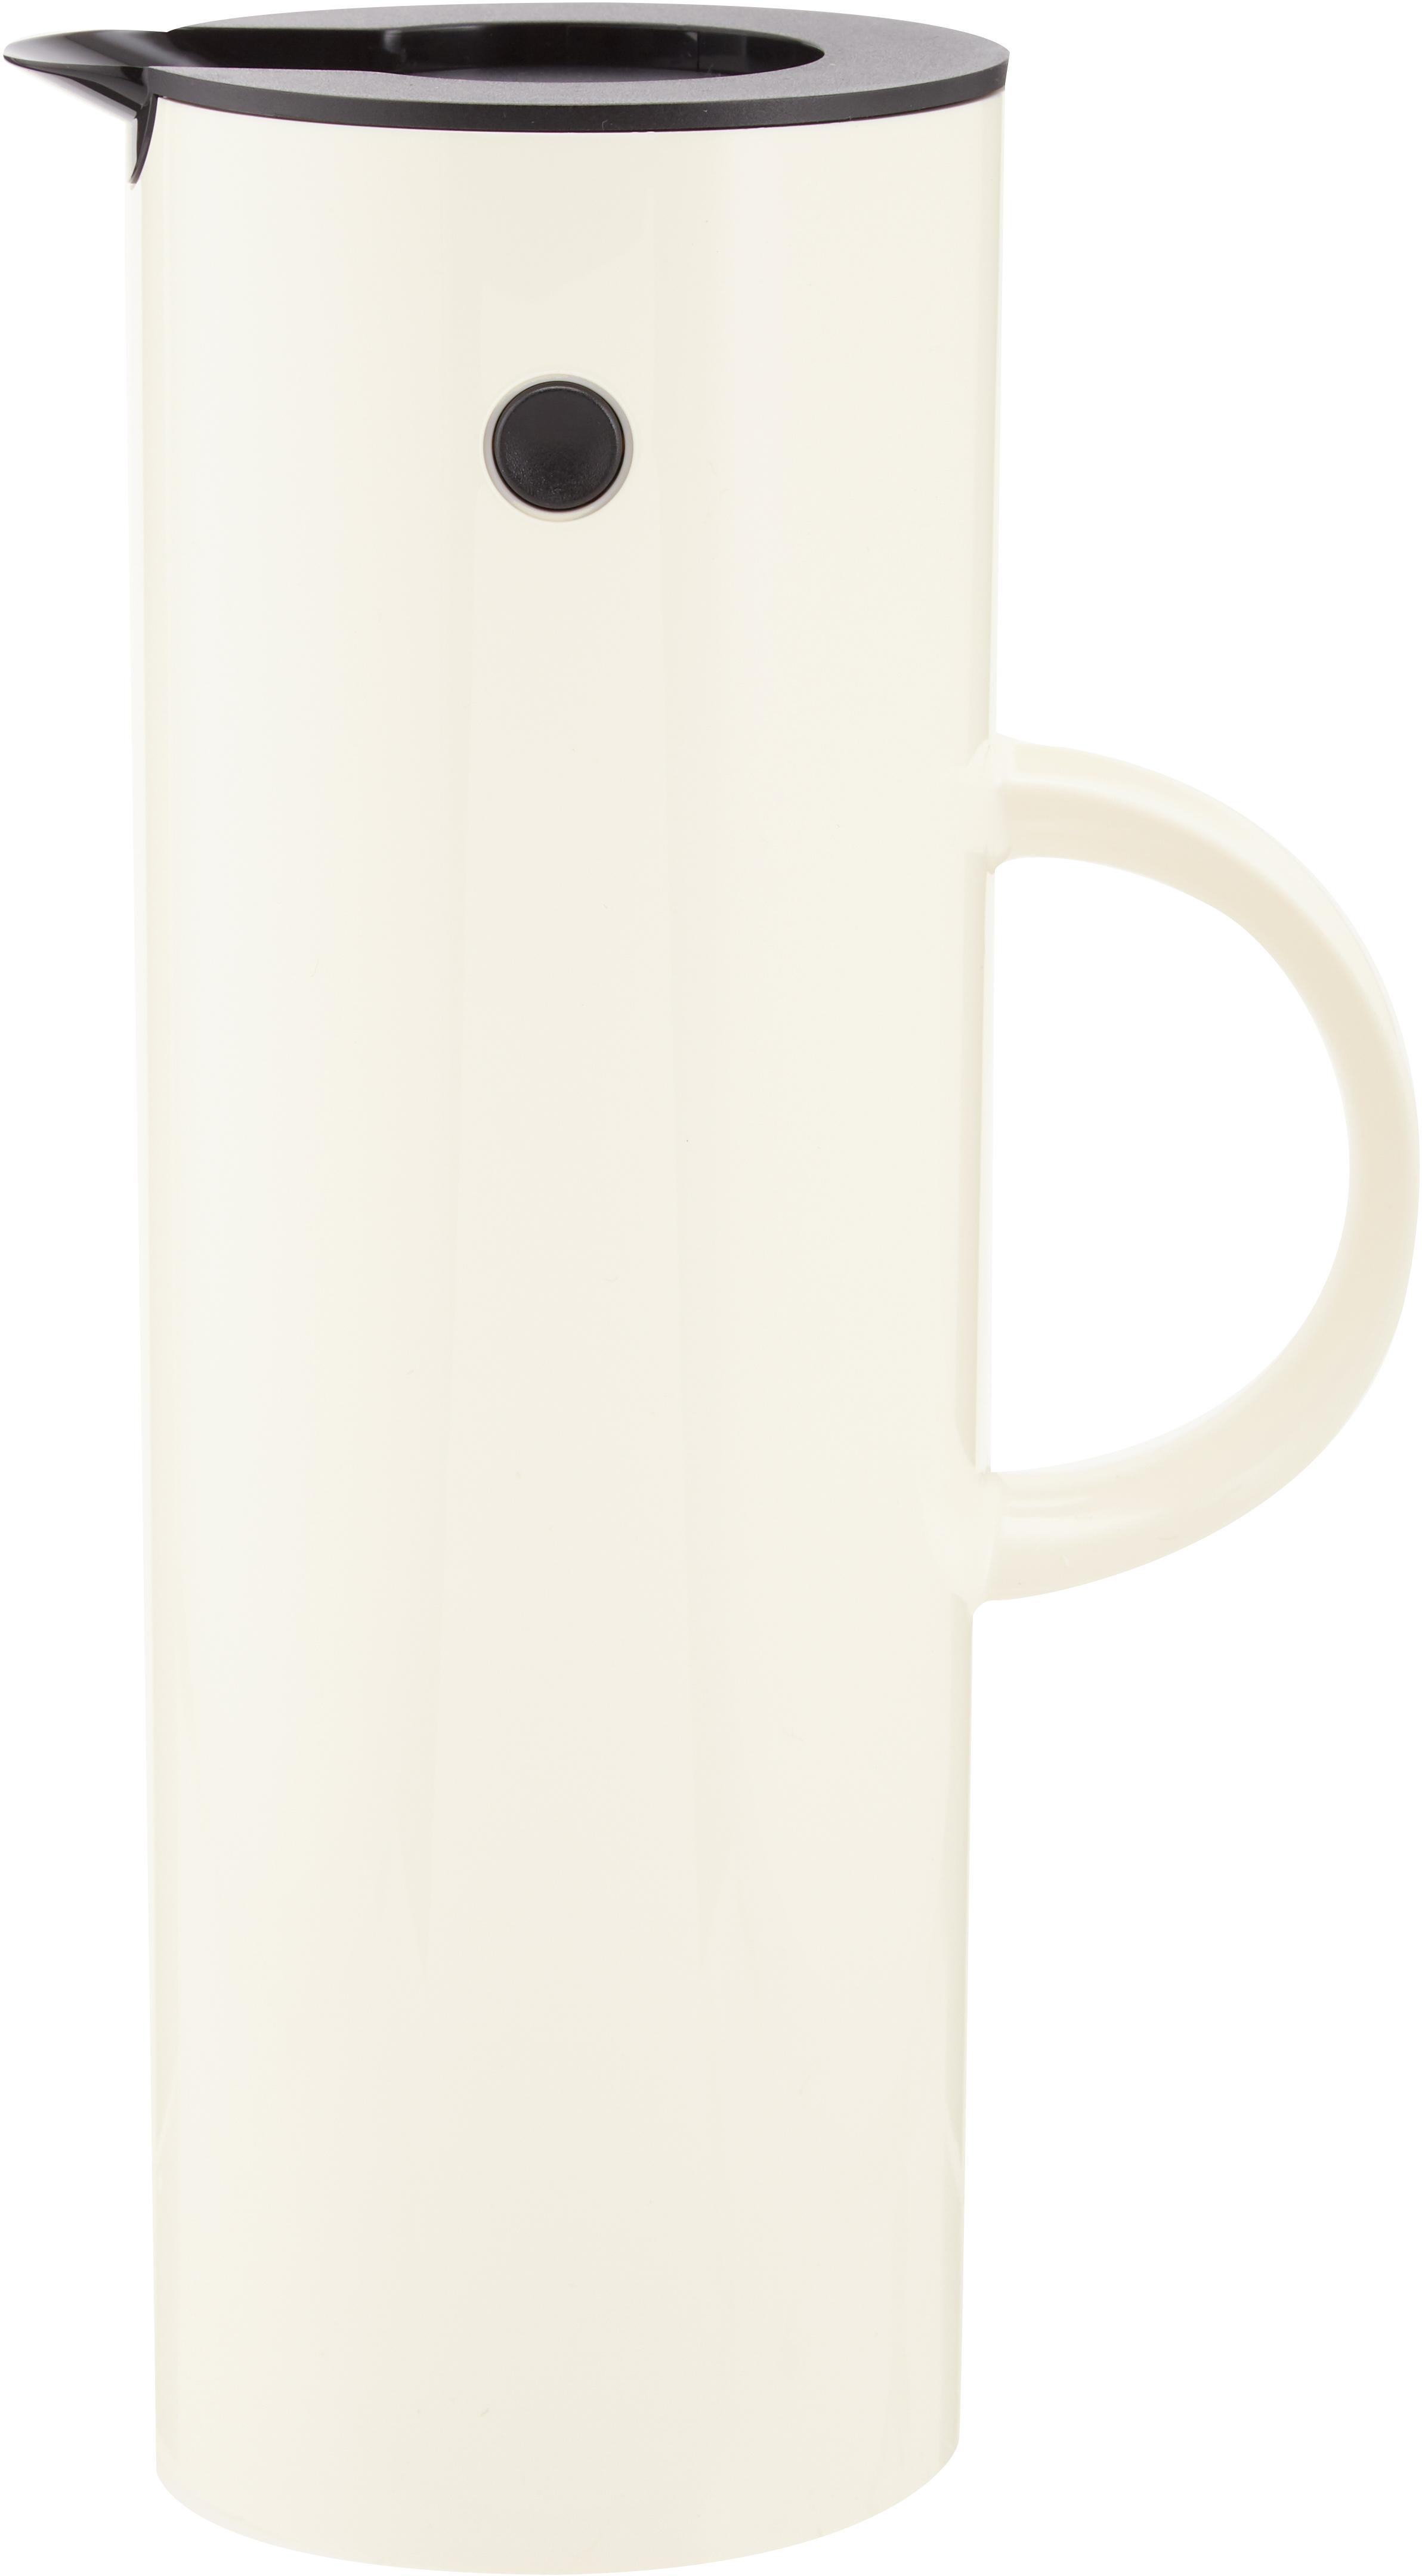 Thermosfles EM77 in glanzend crèmewit, ABS, aan de binnenkant met glazen inleg, Wit, 1 L